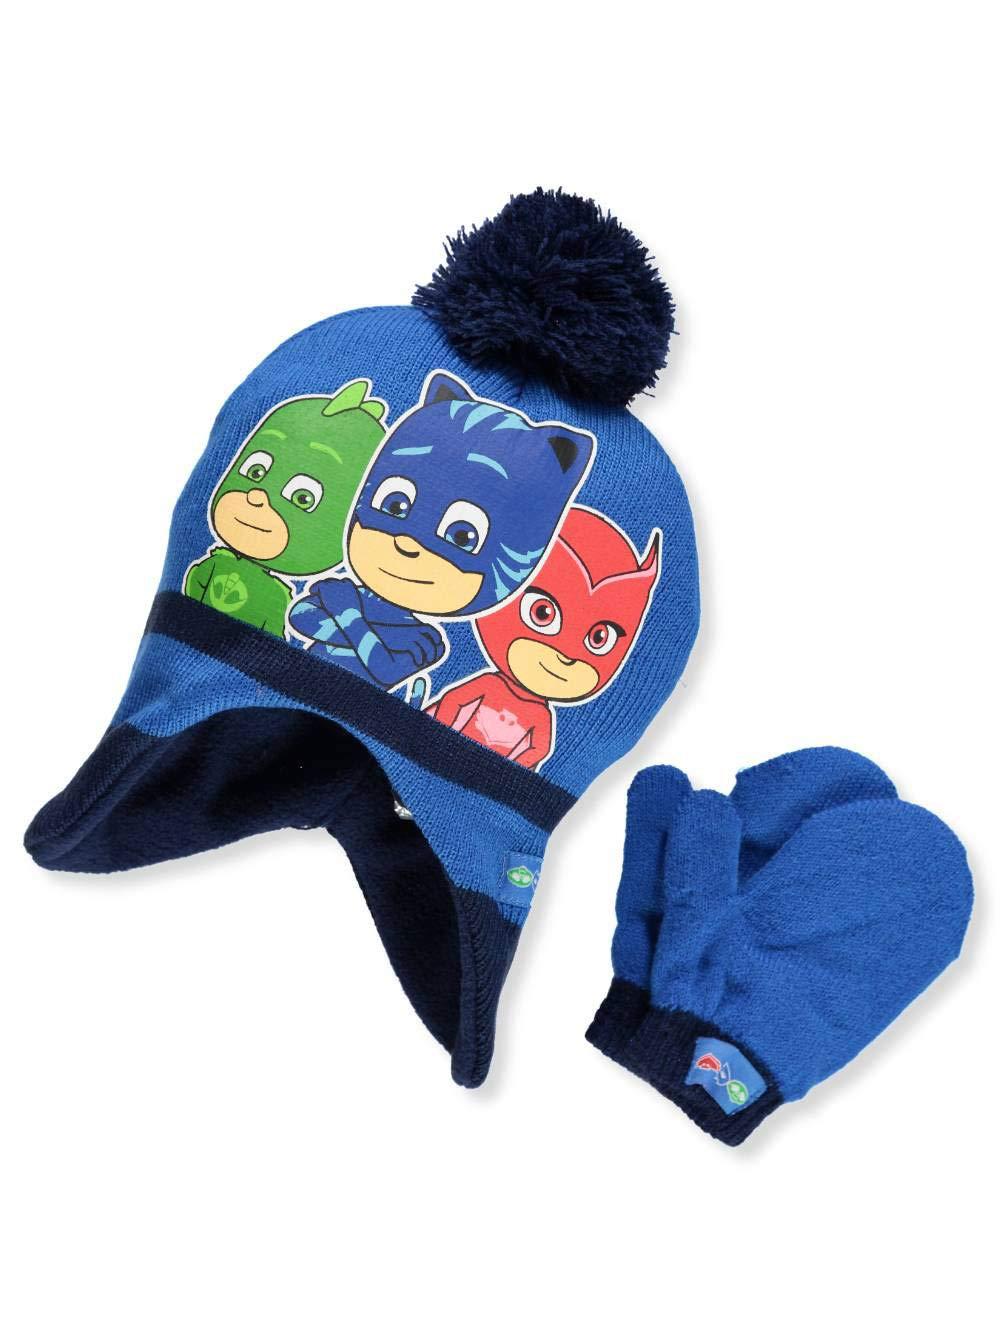 PJ Masks Big Boys' Beanie & Mittens Set - dark blue, one size